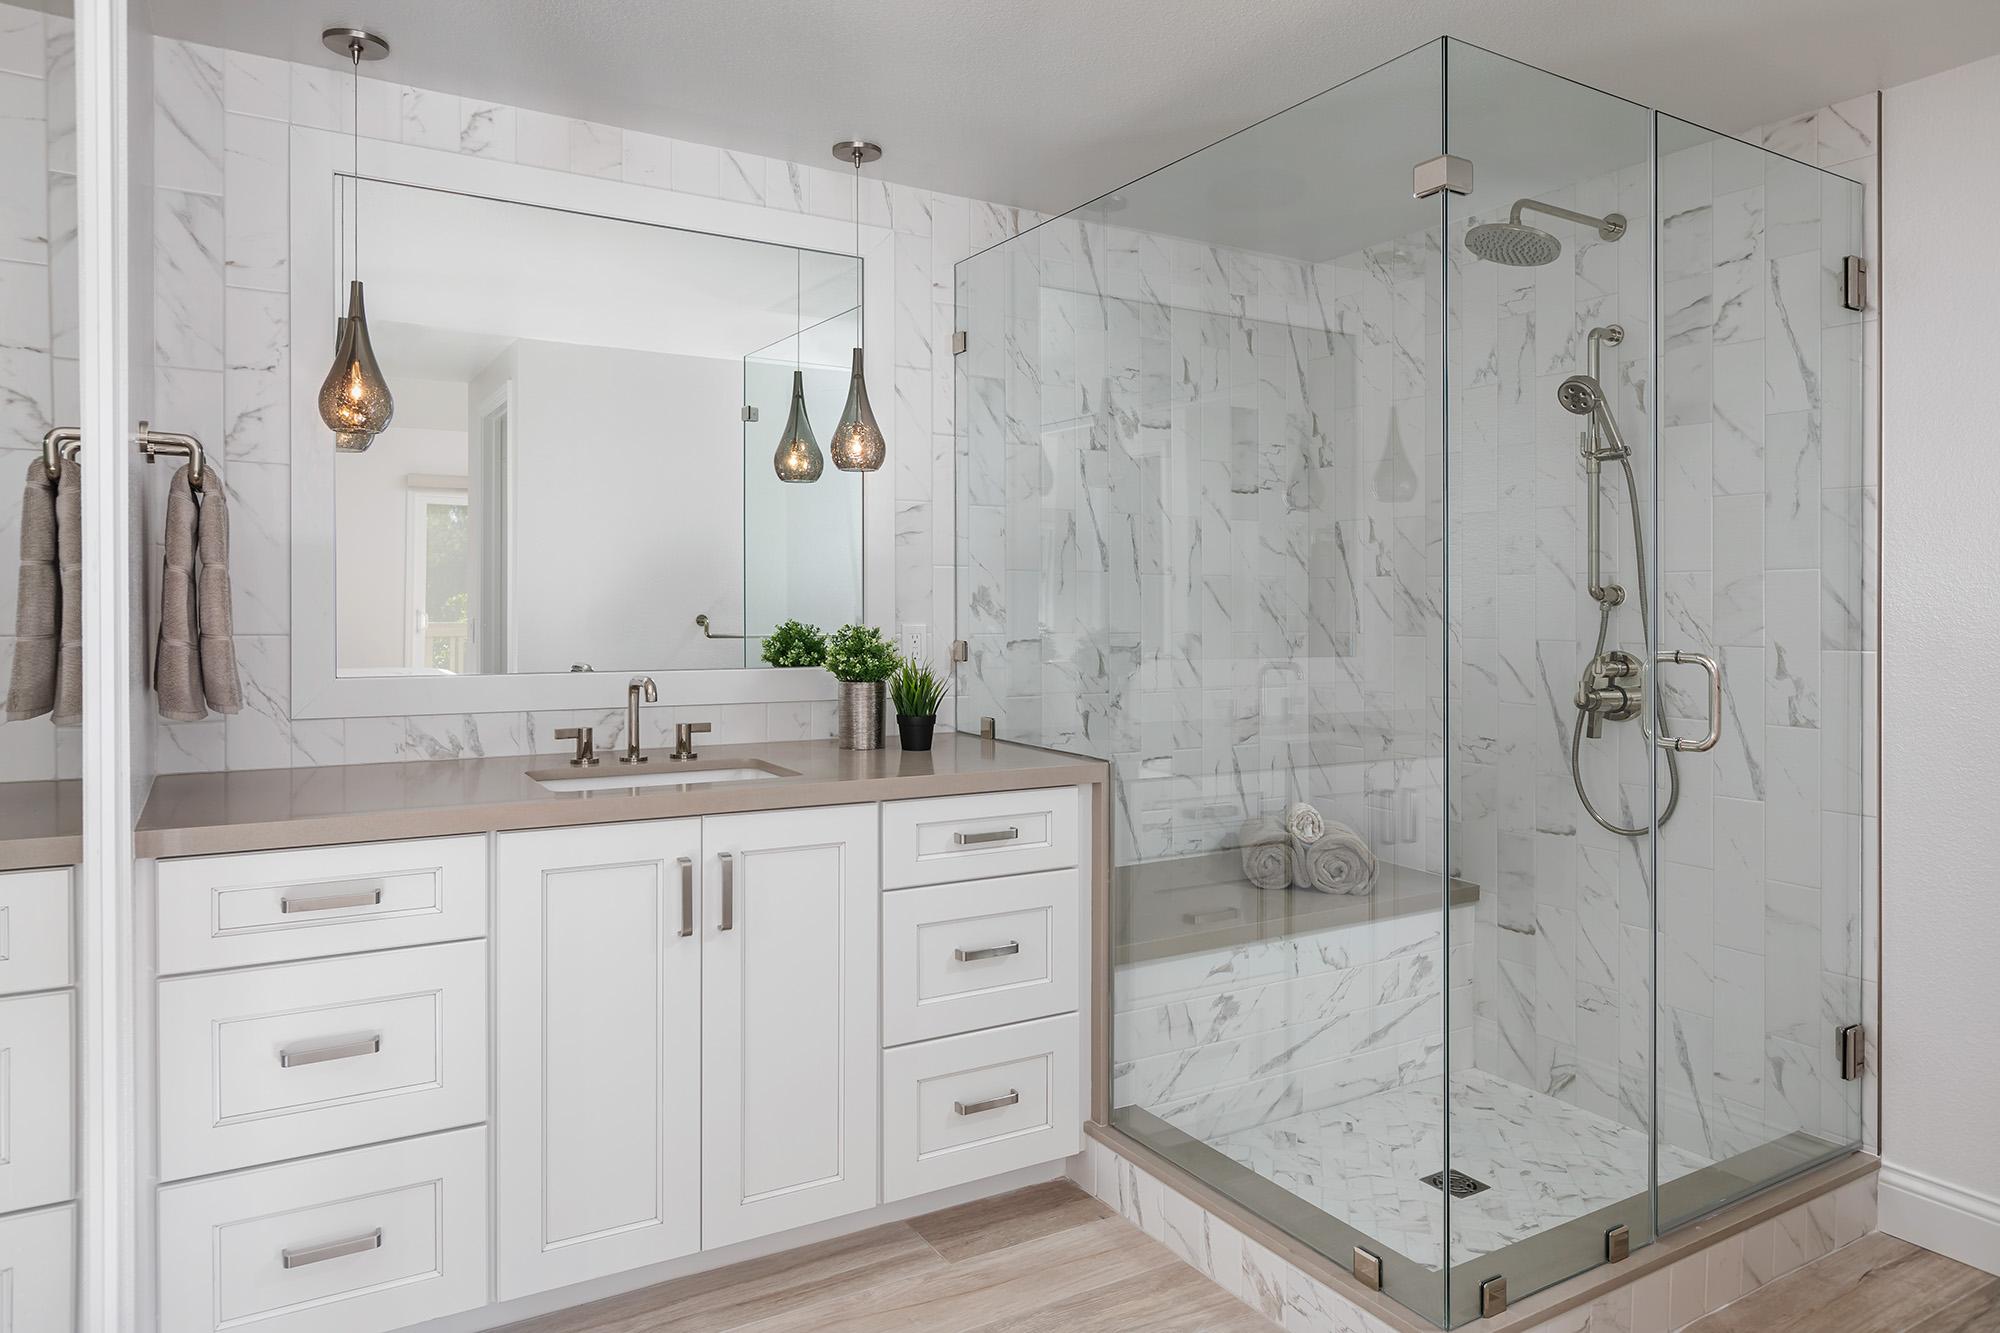 Irvine bathroom remodel